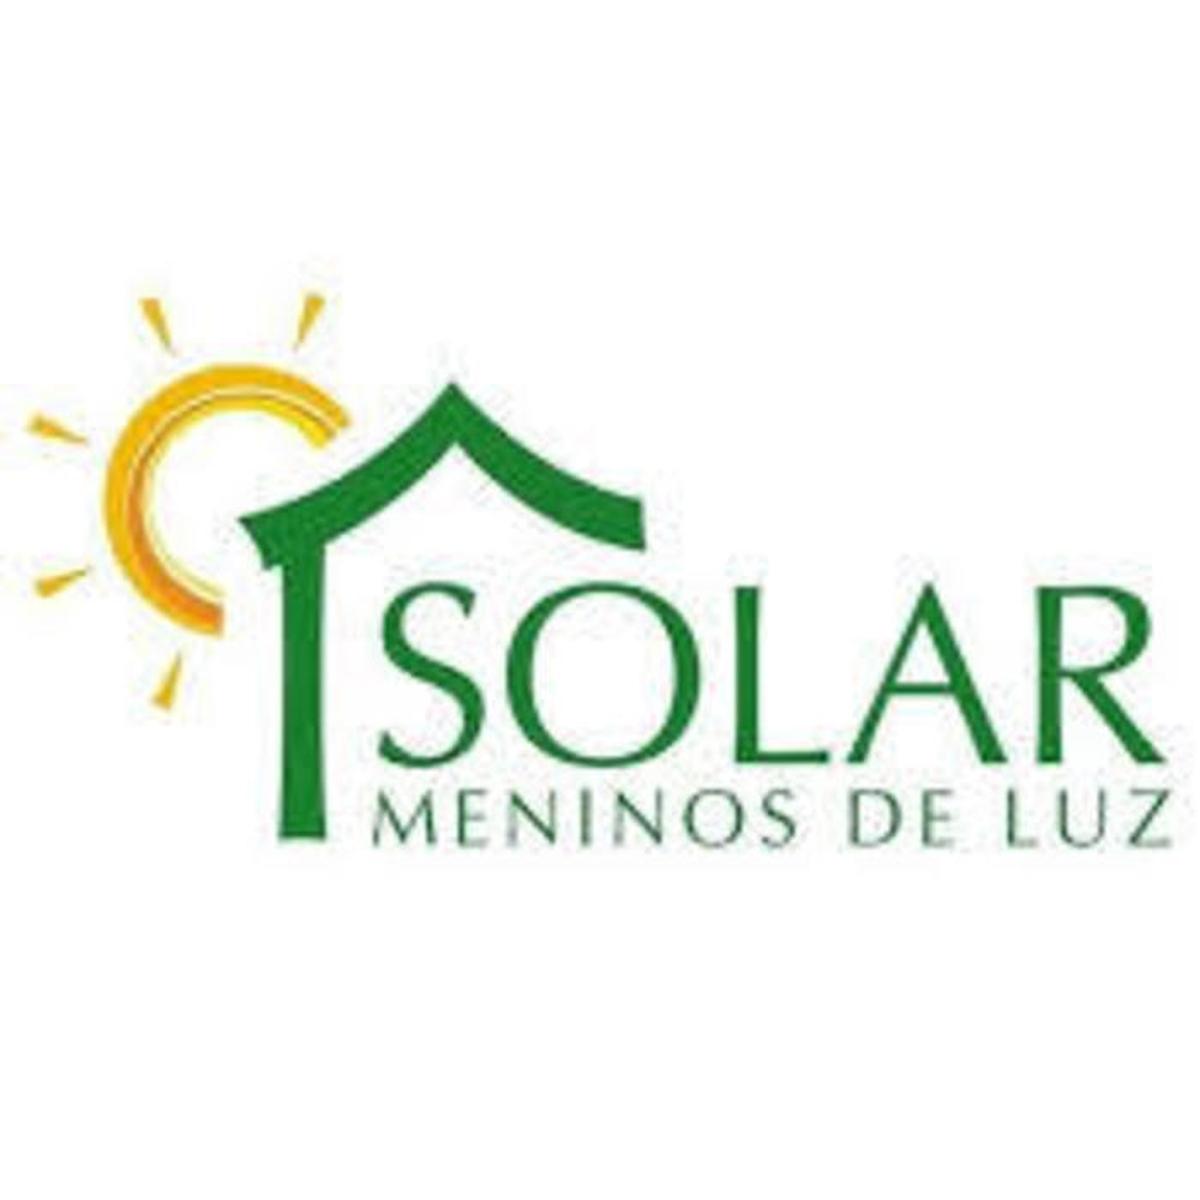 O SOLAR MENINOS DE LUZ PRECISA DE AJUDA